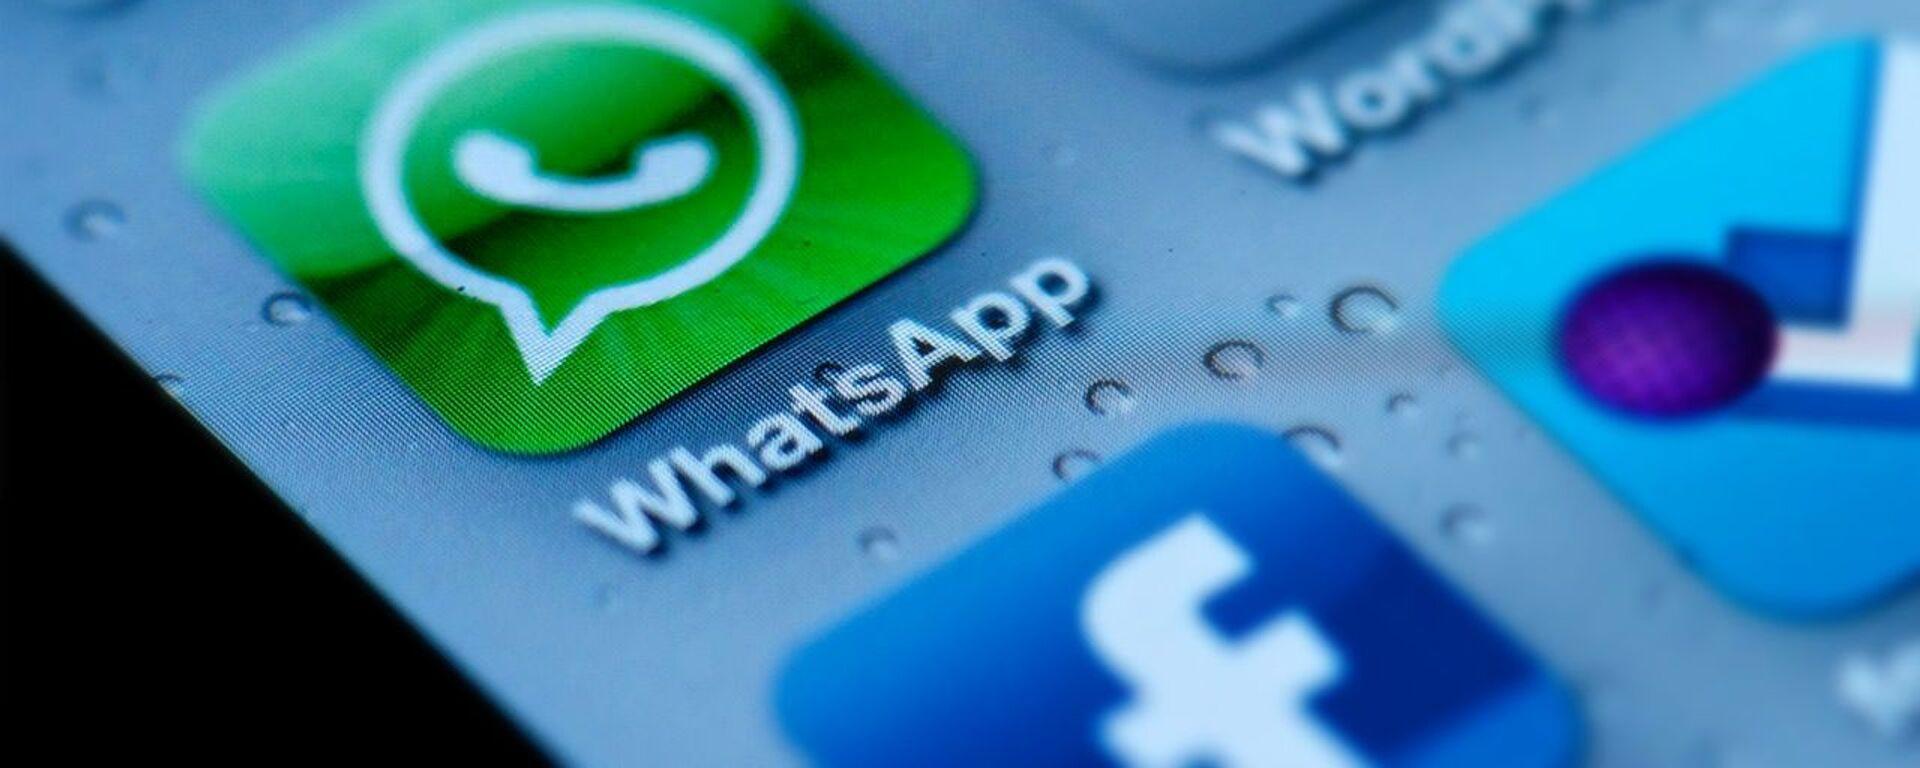 WhatsApp - Sputnik Italia, 1920, 04.08.2021